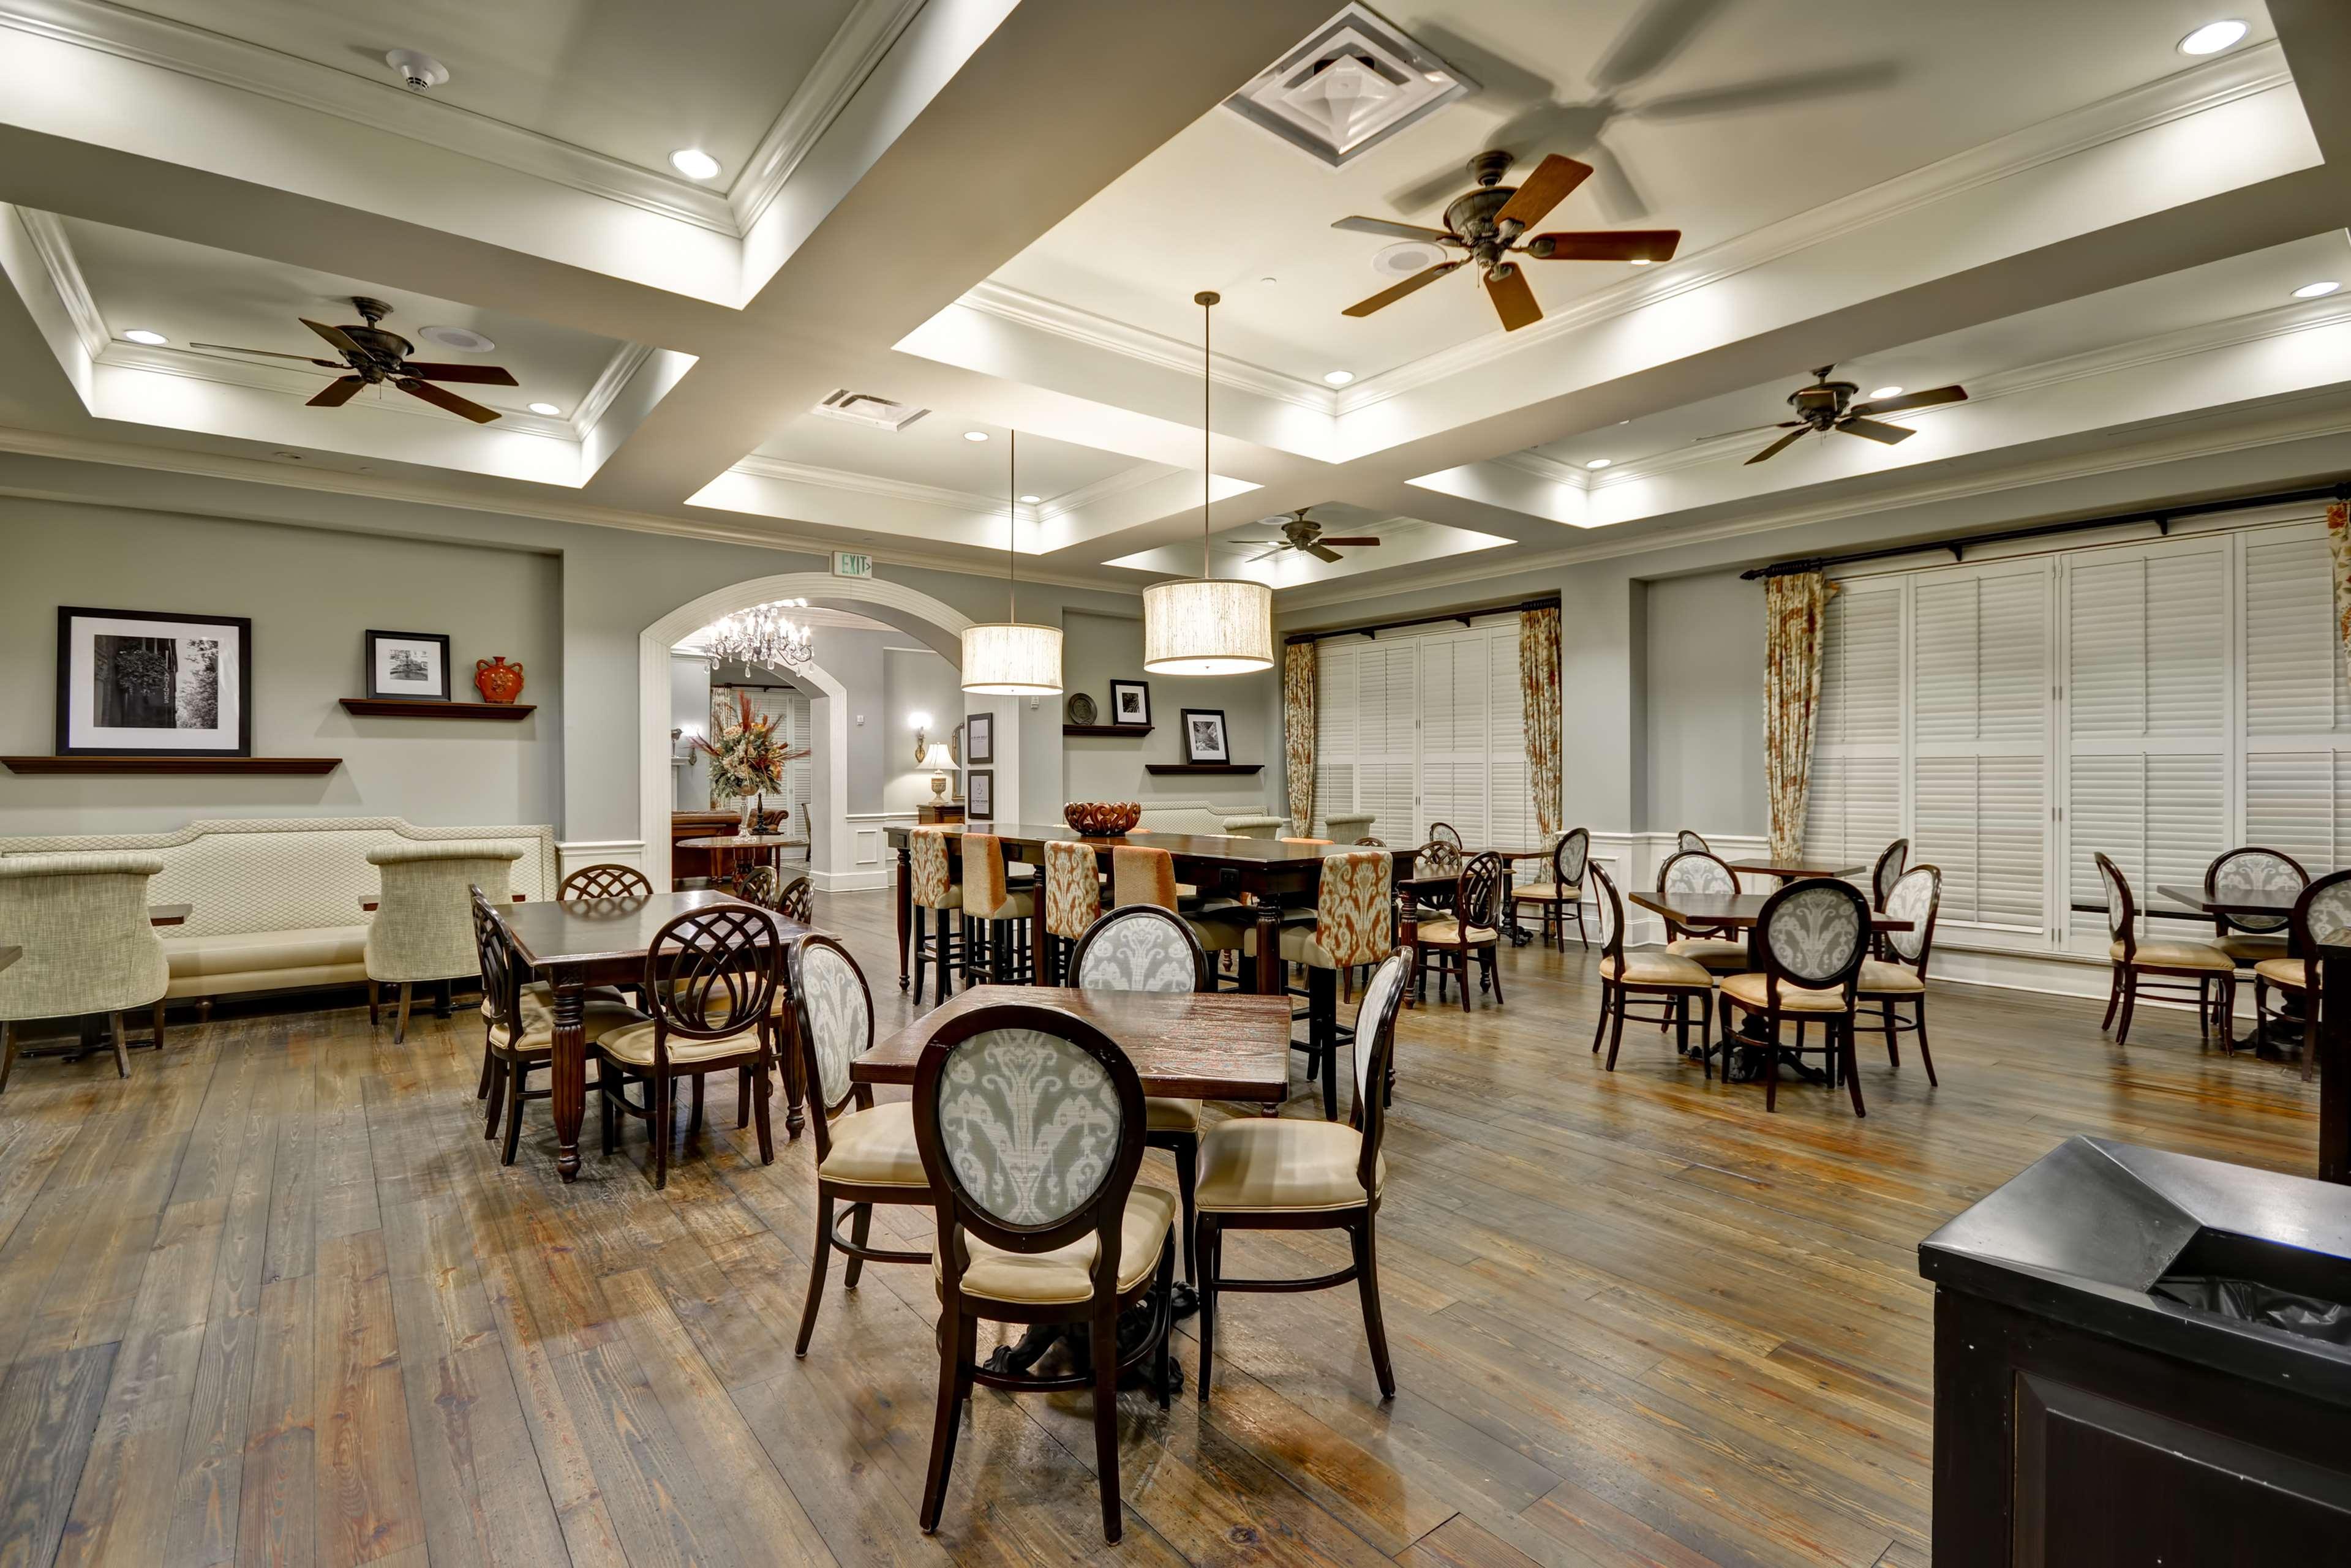 Hampton Inn & Suites Savannah Historic District image 19